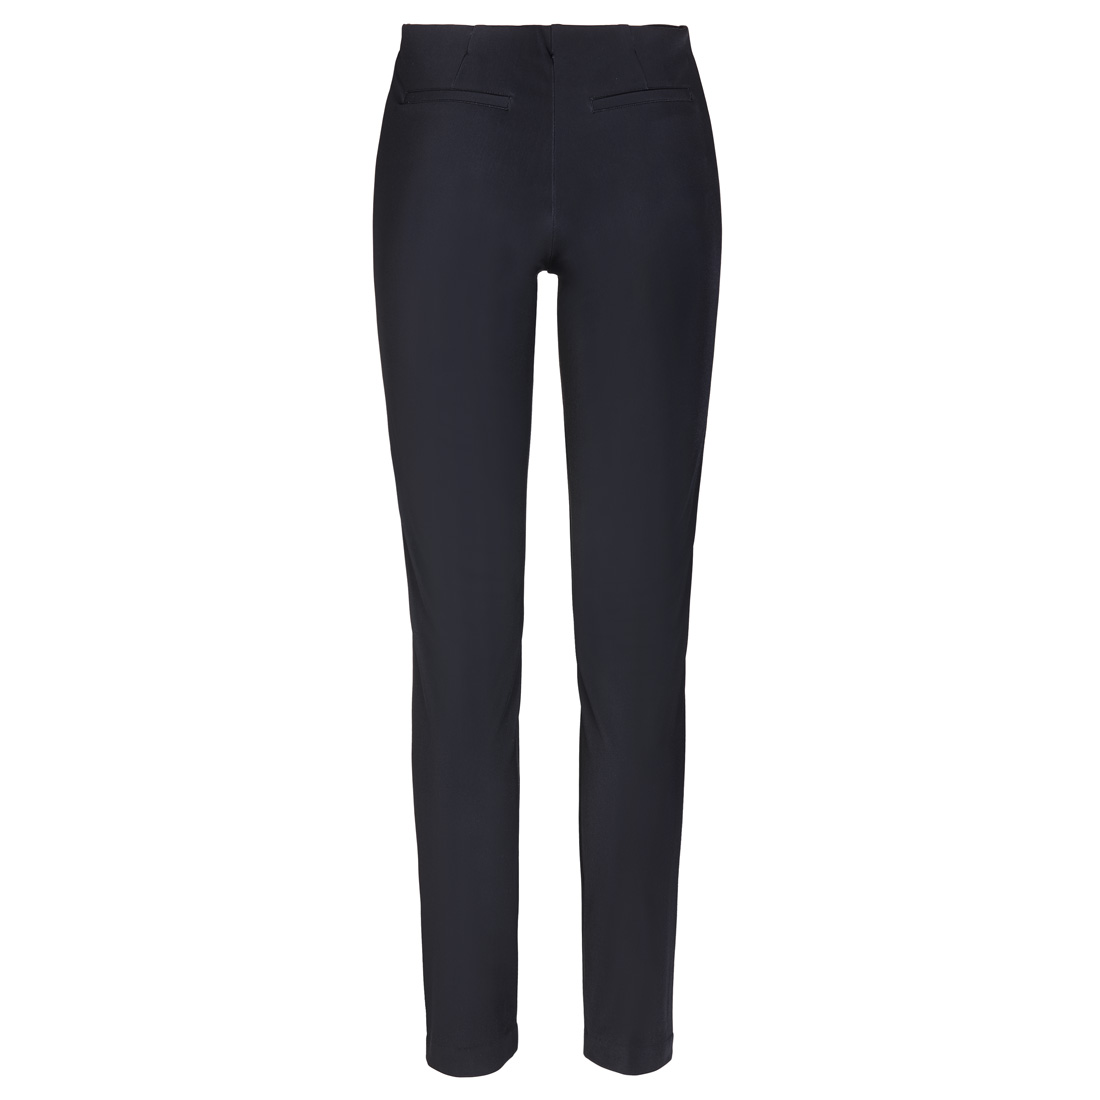 Damen Slim Fit long Stretchhose Cold Protection